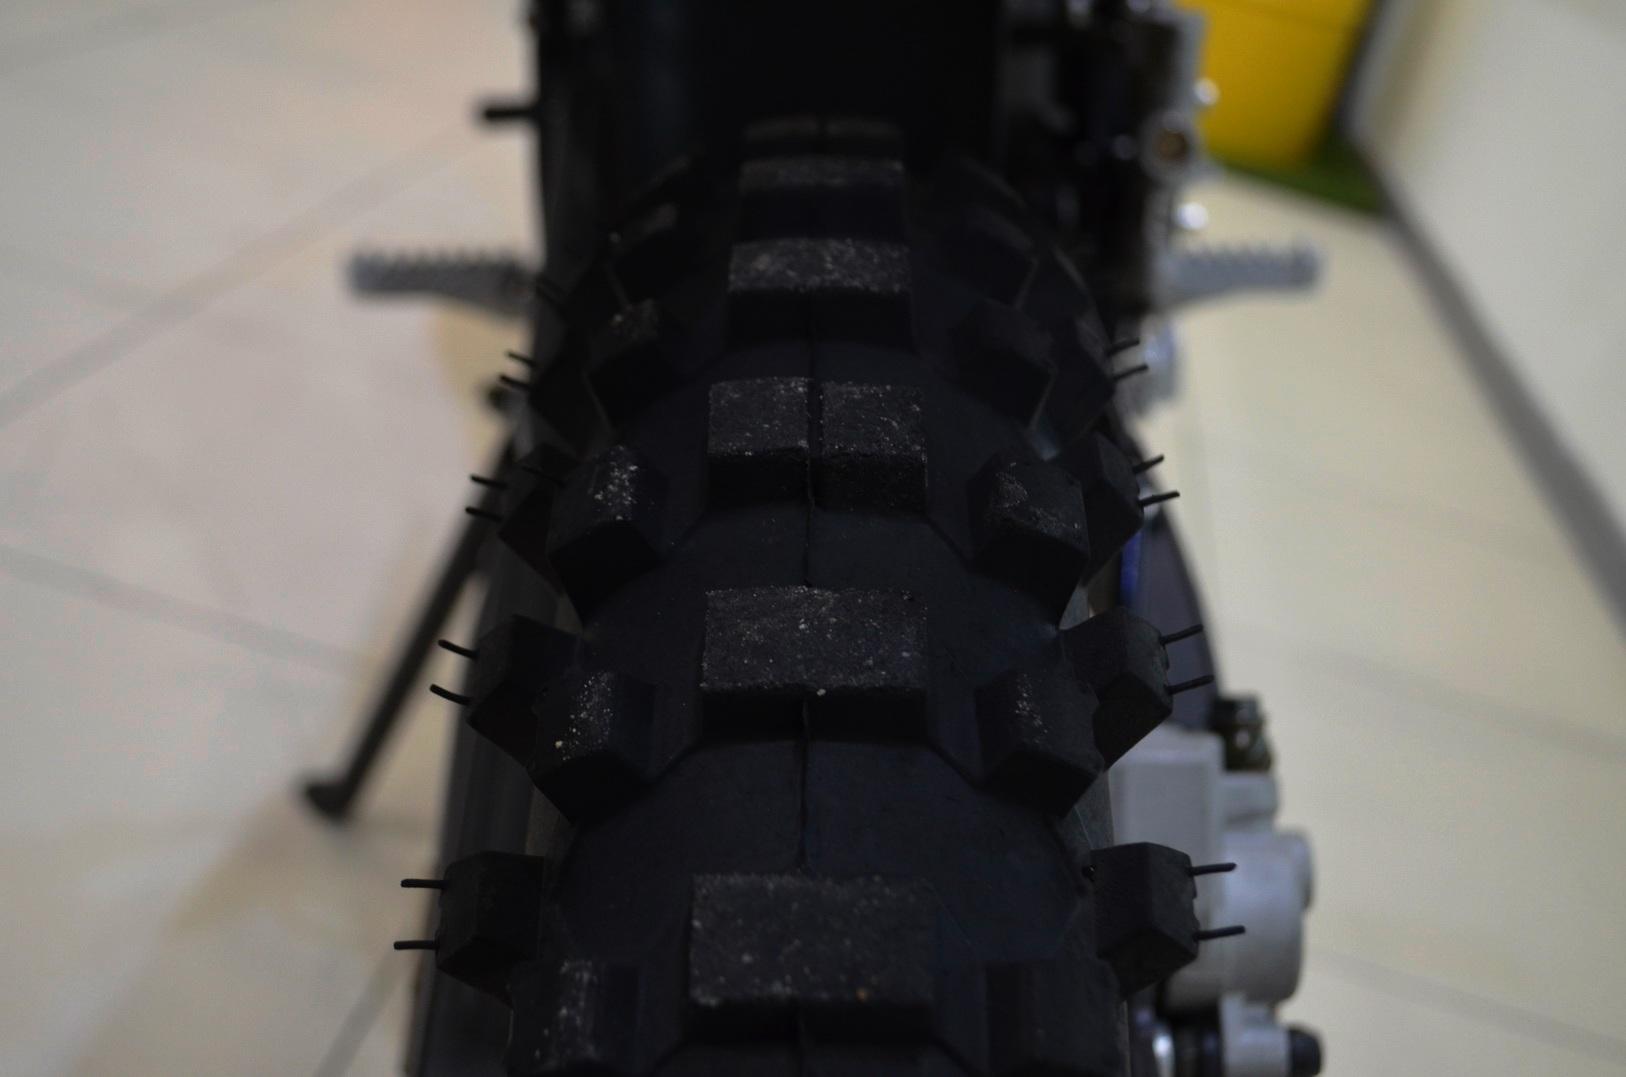 ПИТБАЙК YCF BIGY 150 MX Enduro 2018  Артмото - купить квадроцикл в украине и харькове, мотоцикл, снегоход, скутер, мопед, электромобиль